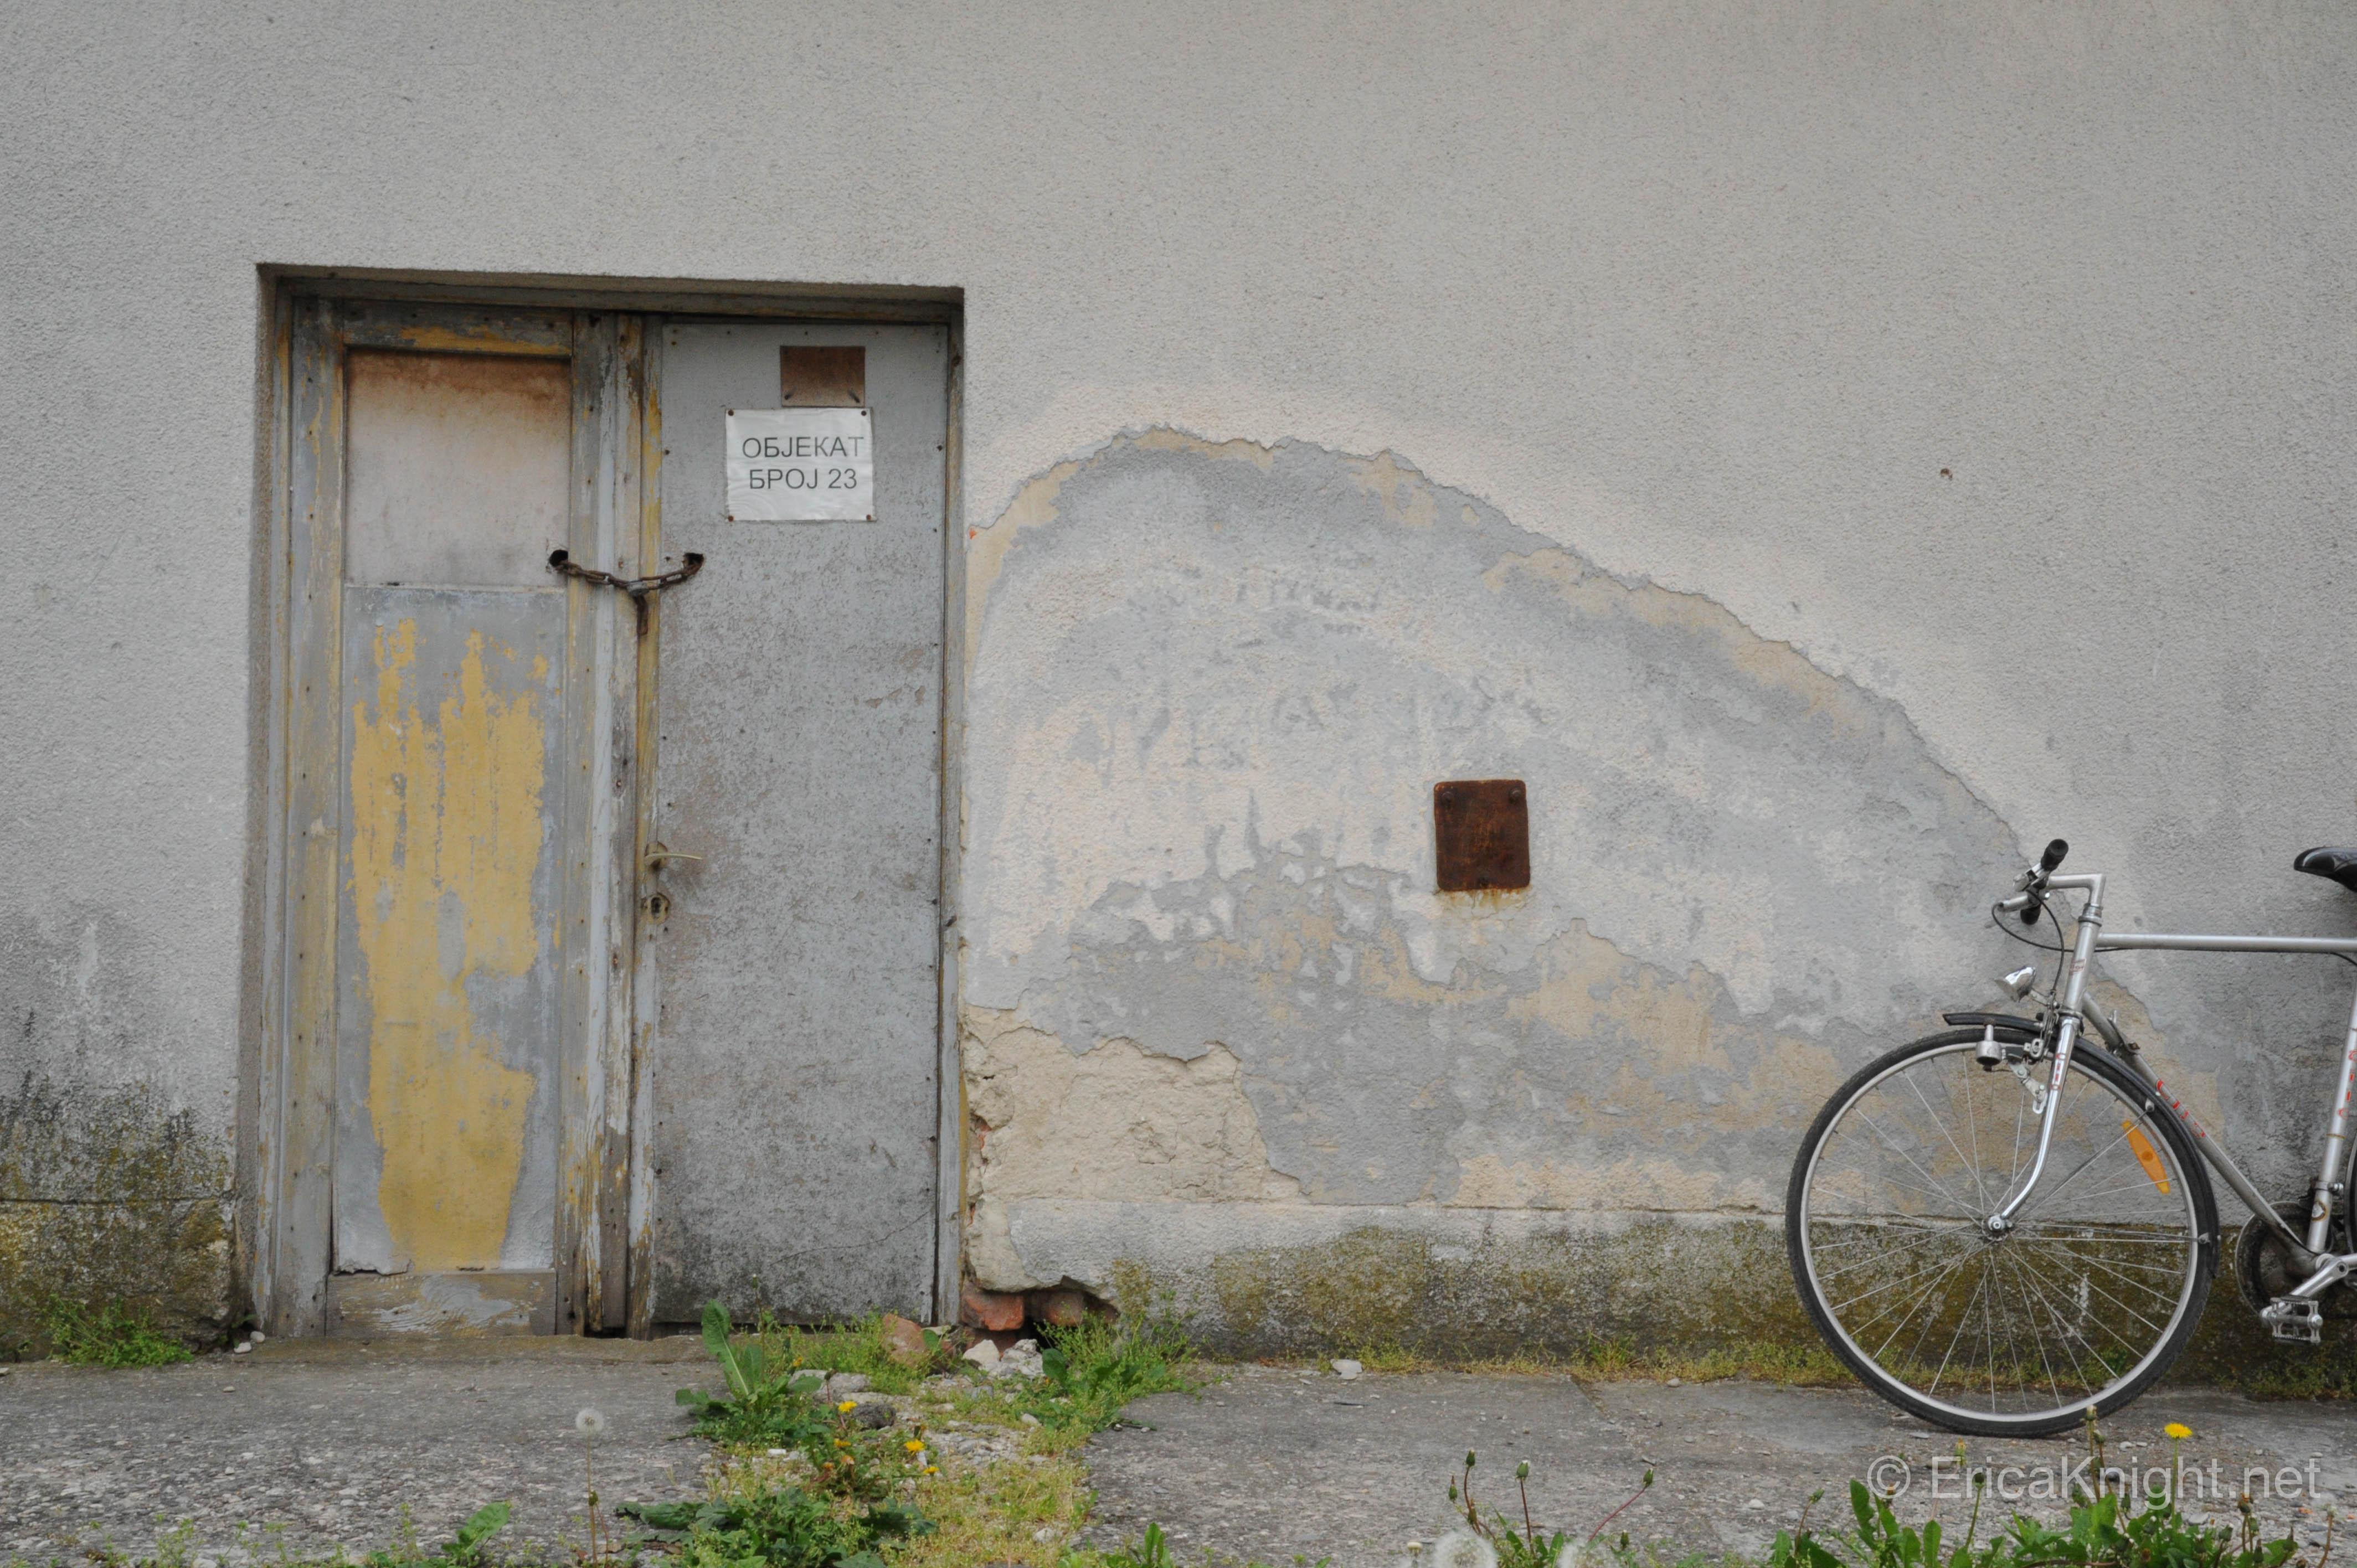 Doorway & Bike - Sarajevo, Bosnia